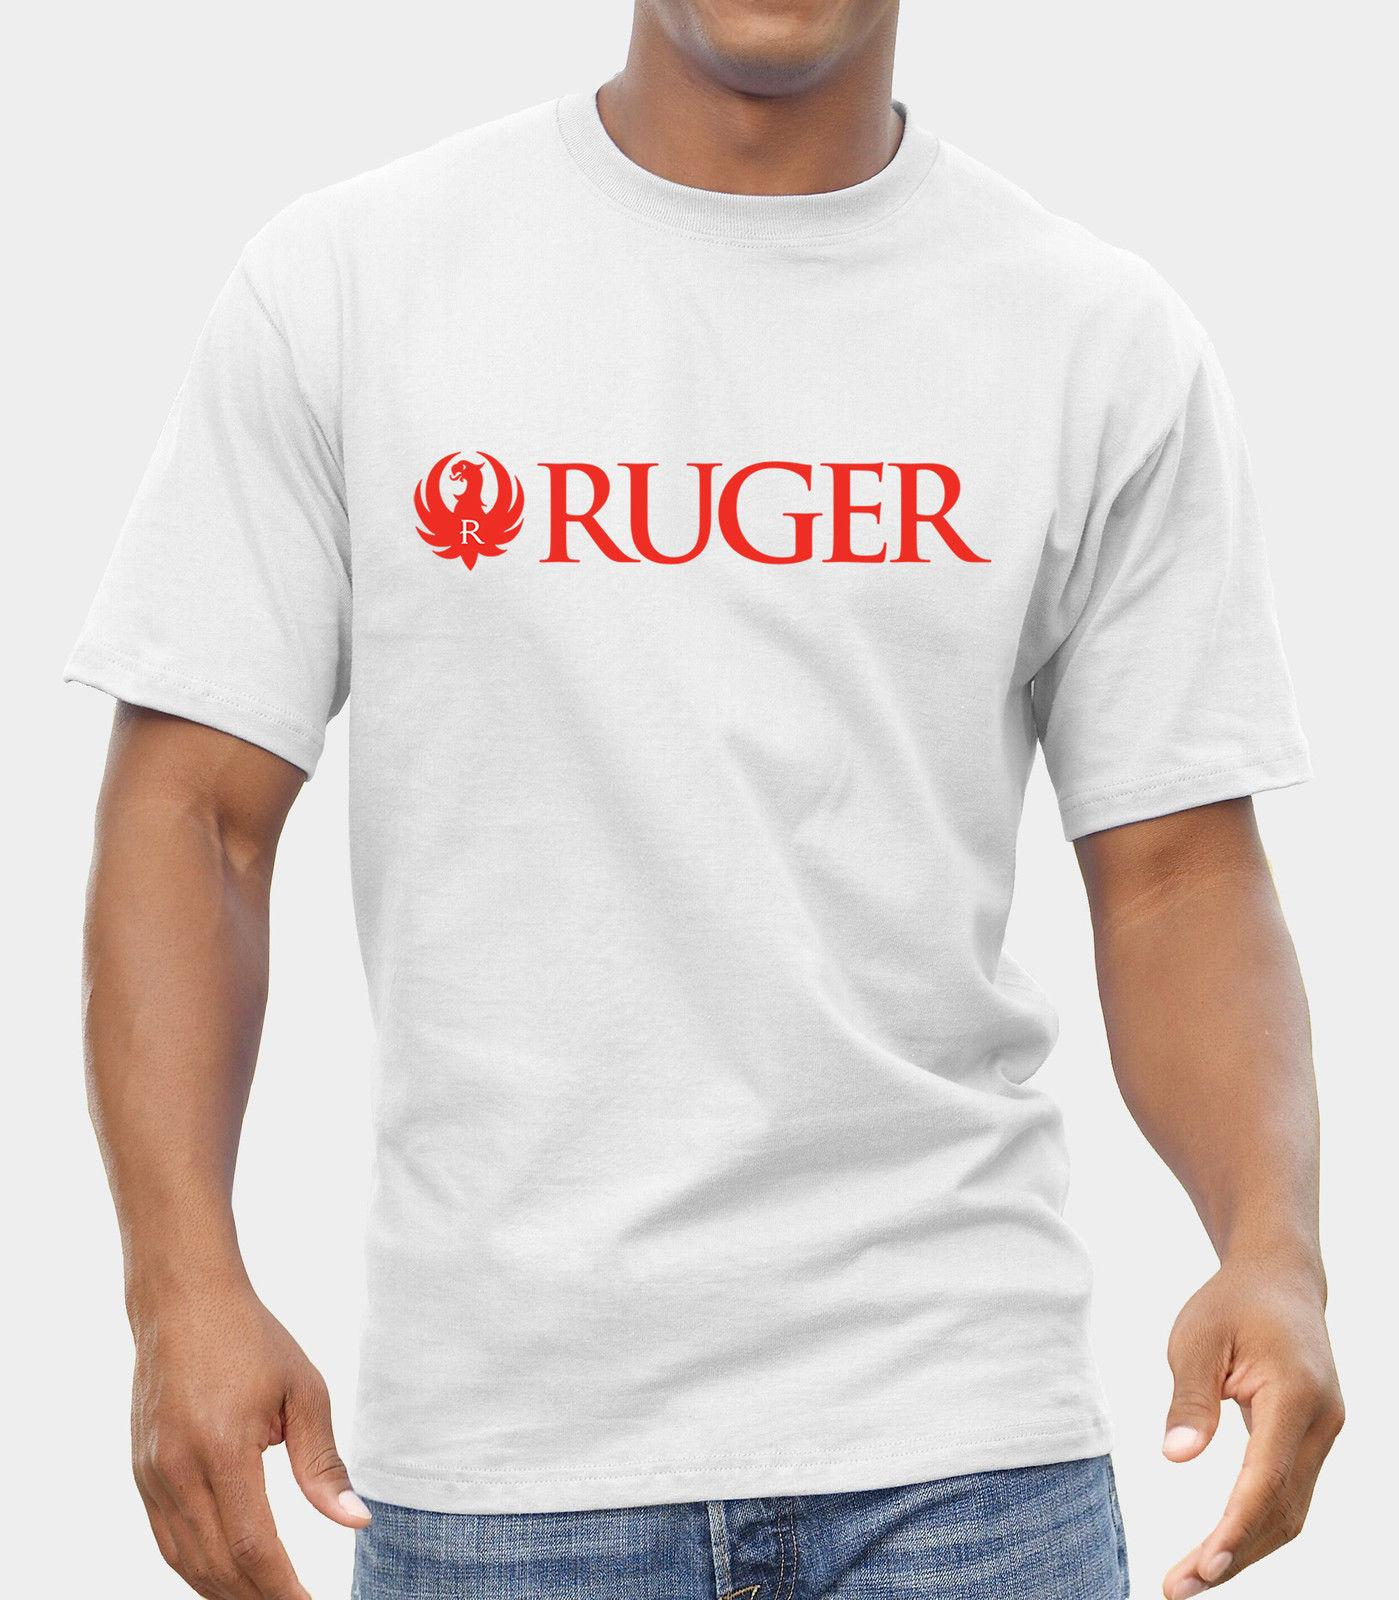 140cdd18c16 Ruger GUNS LOGO T SHIRT FRUIT OF THE LOOM PRINT BY EPSON Men S Clothing T  Shirts Tees Men Hot Cheap Short Sleeve Male Shirt With T Shirt Buy Funny T  Shirts ...